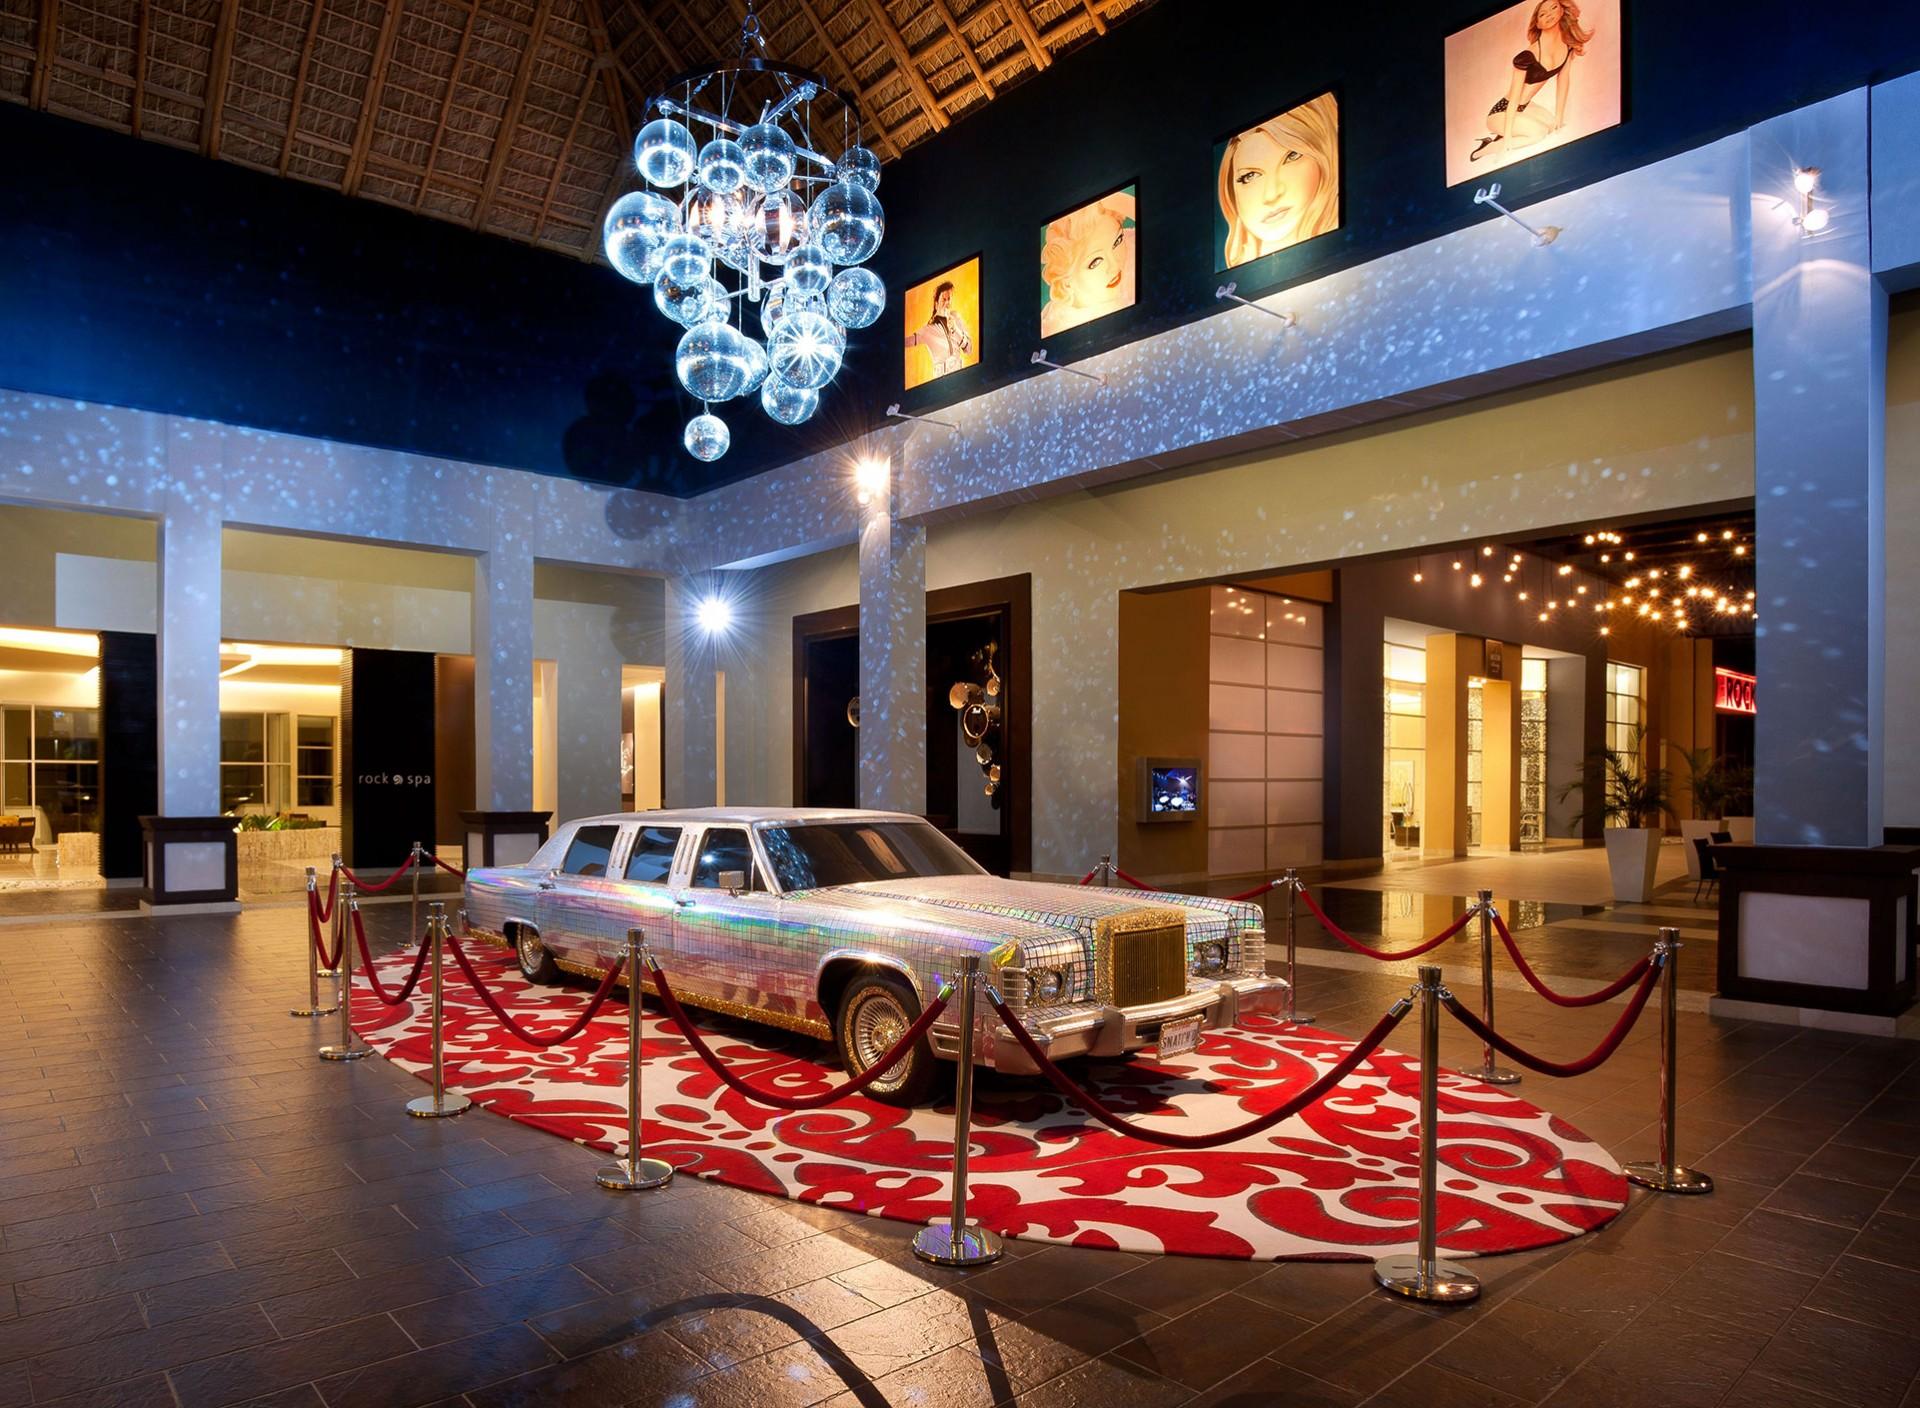 Hotel Renovation Project Hard Rock Punta Cana The